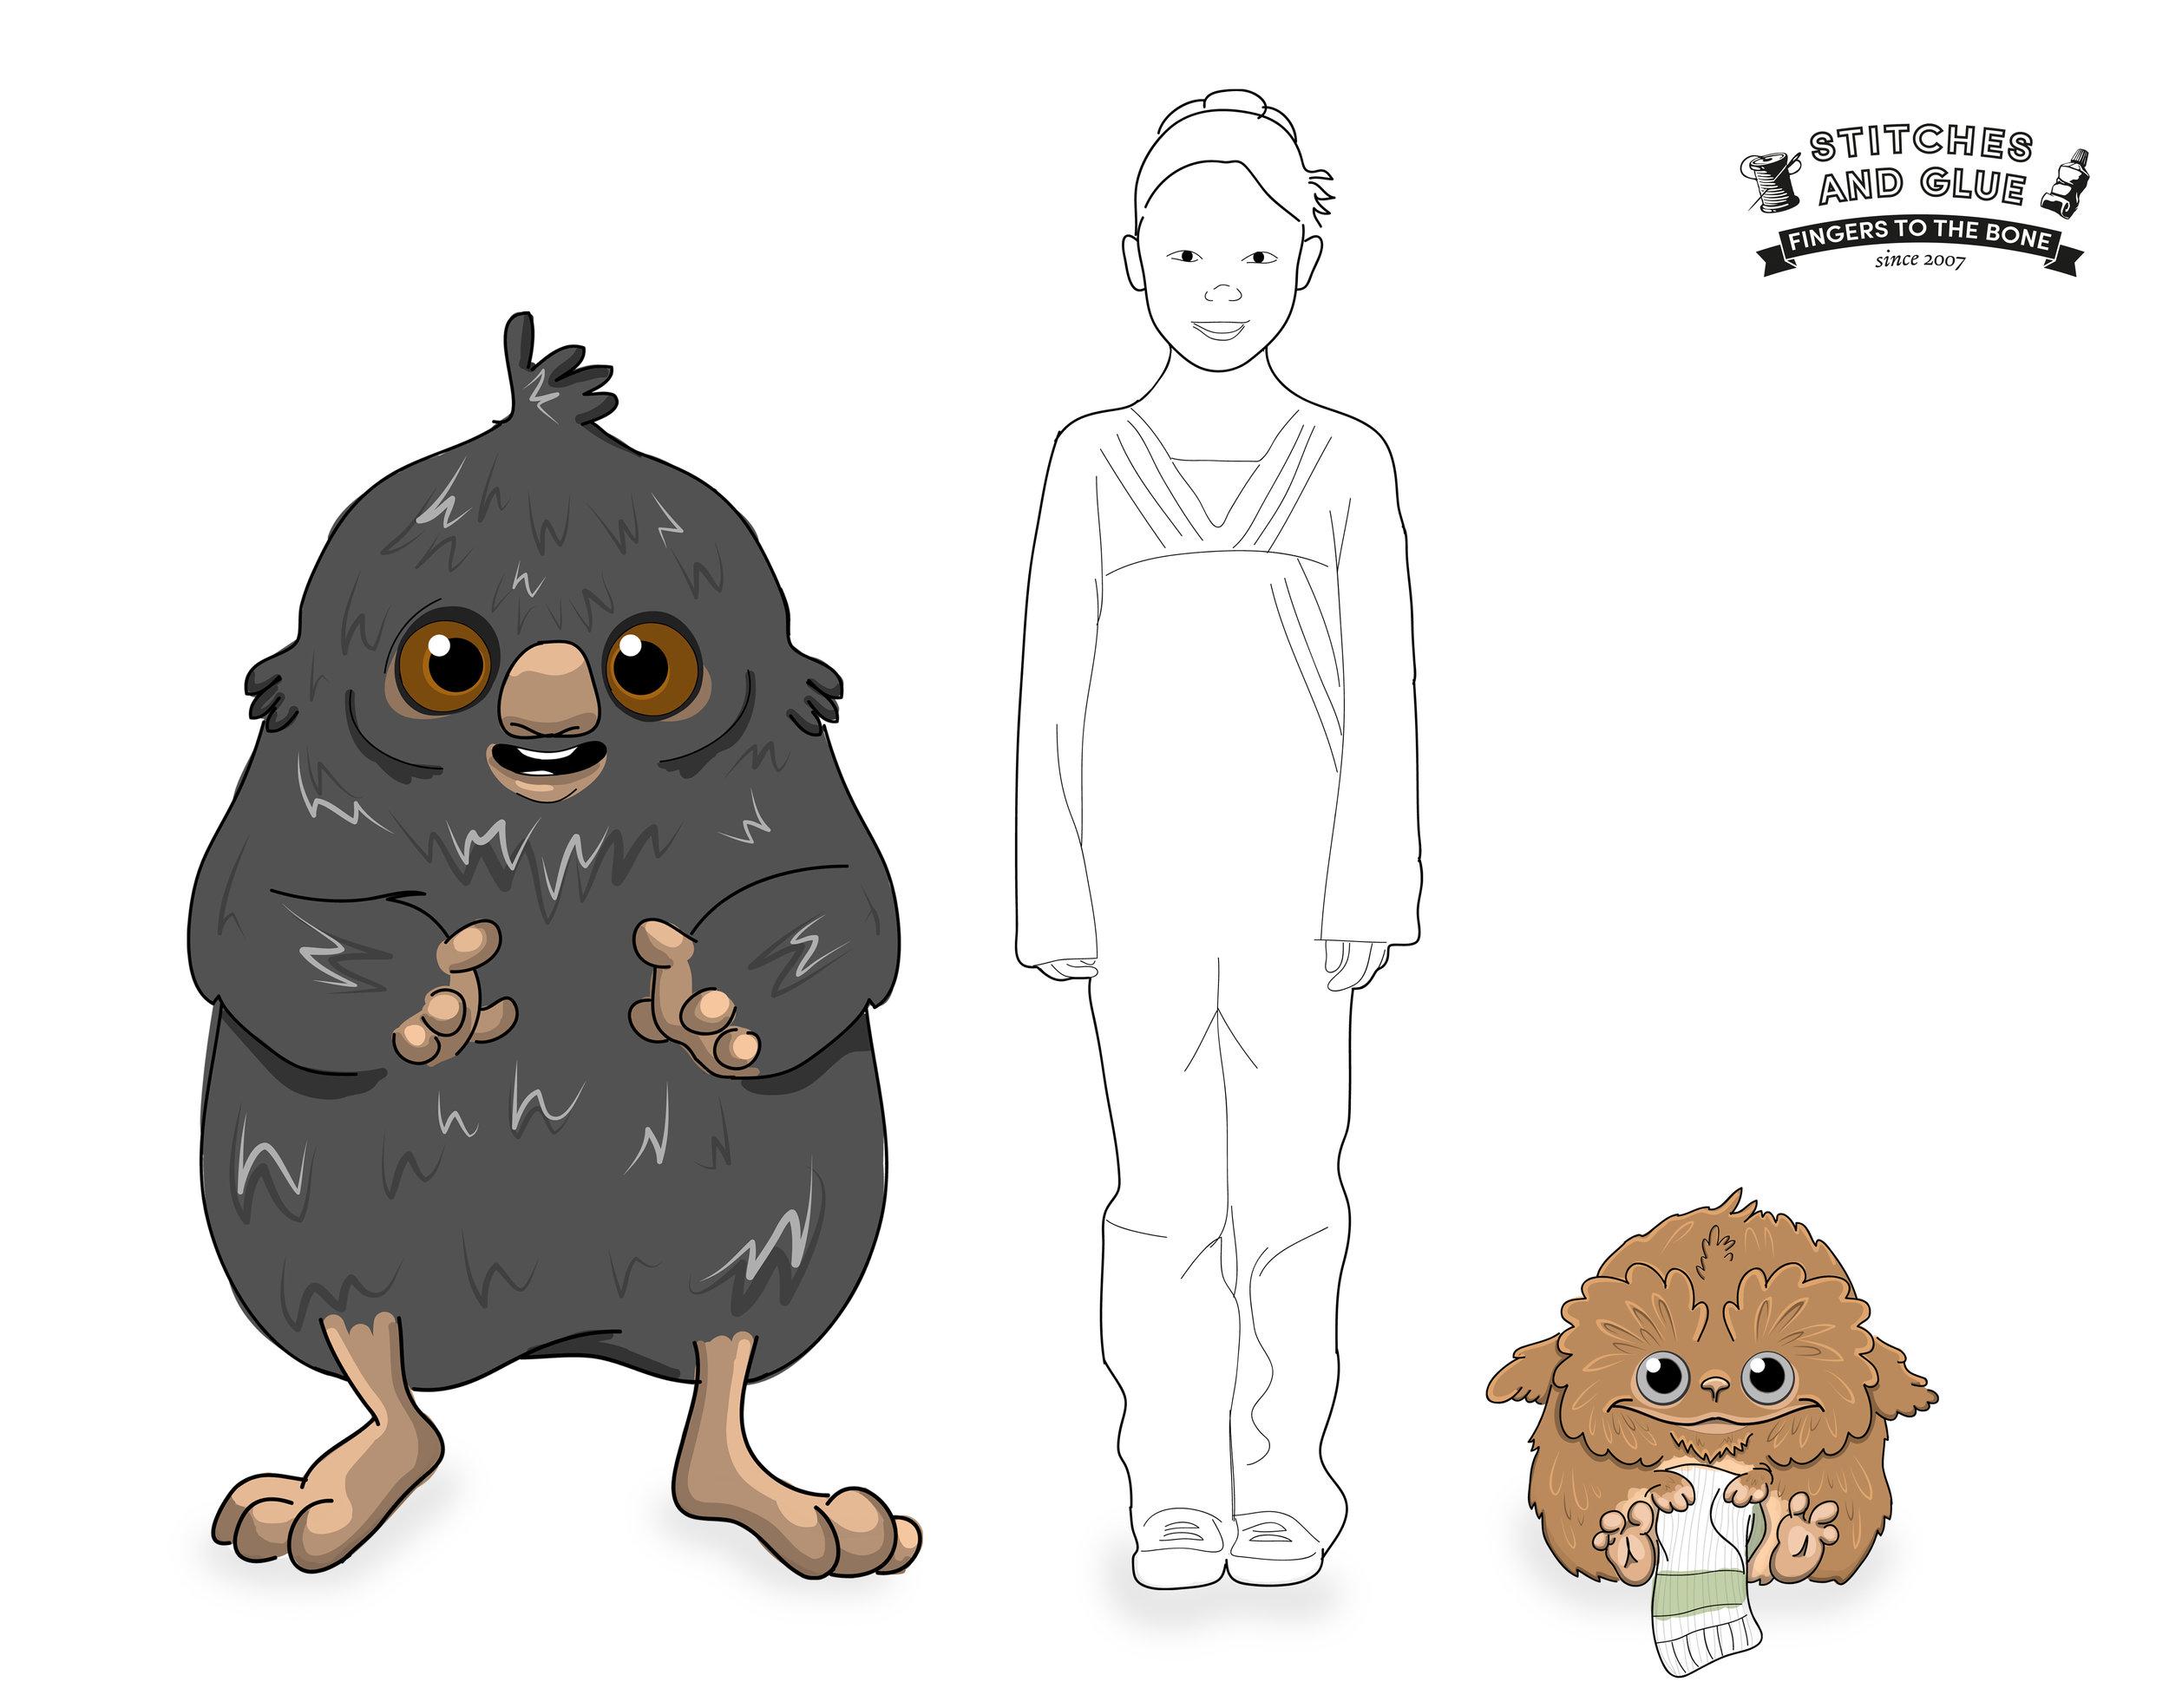 character design- Puppet designers